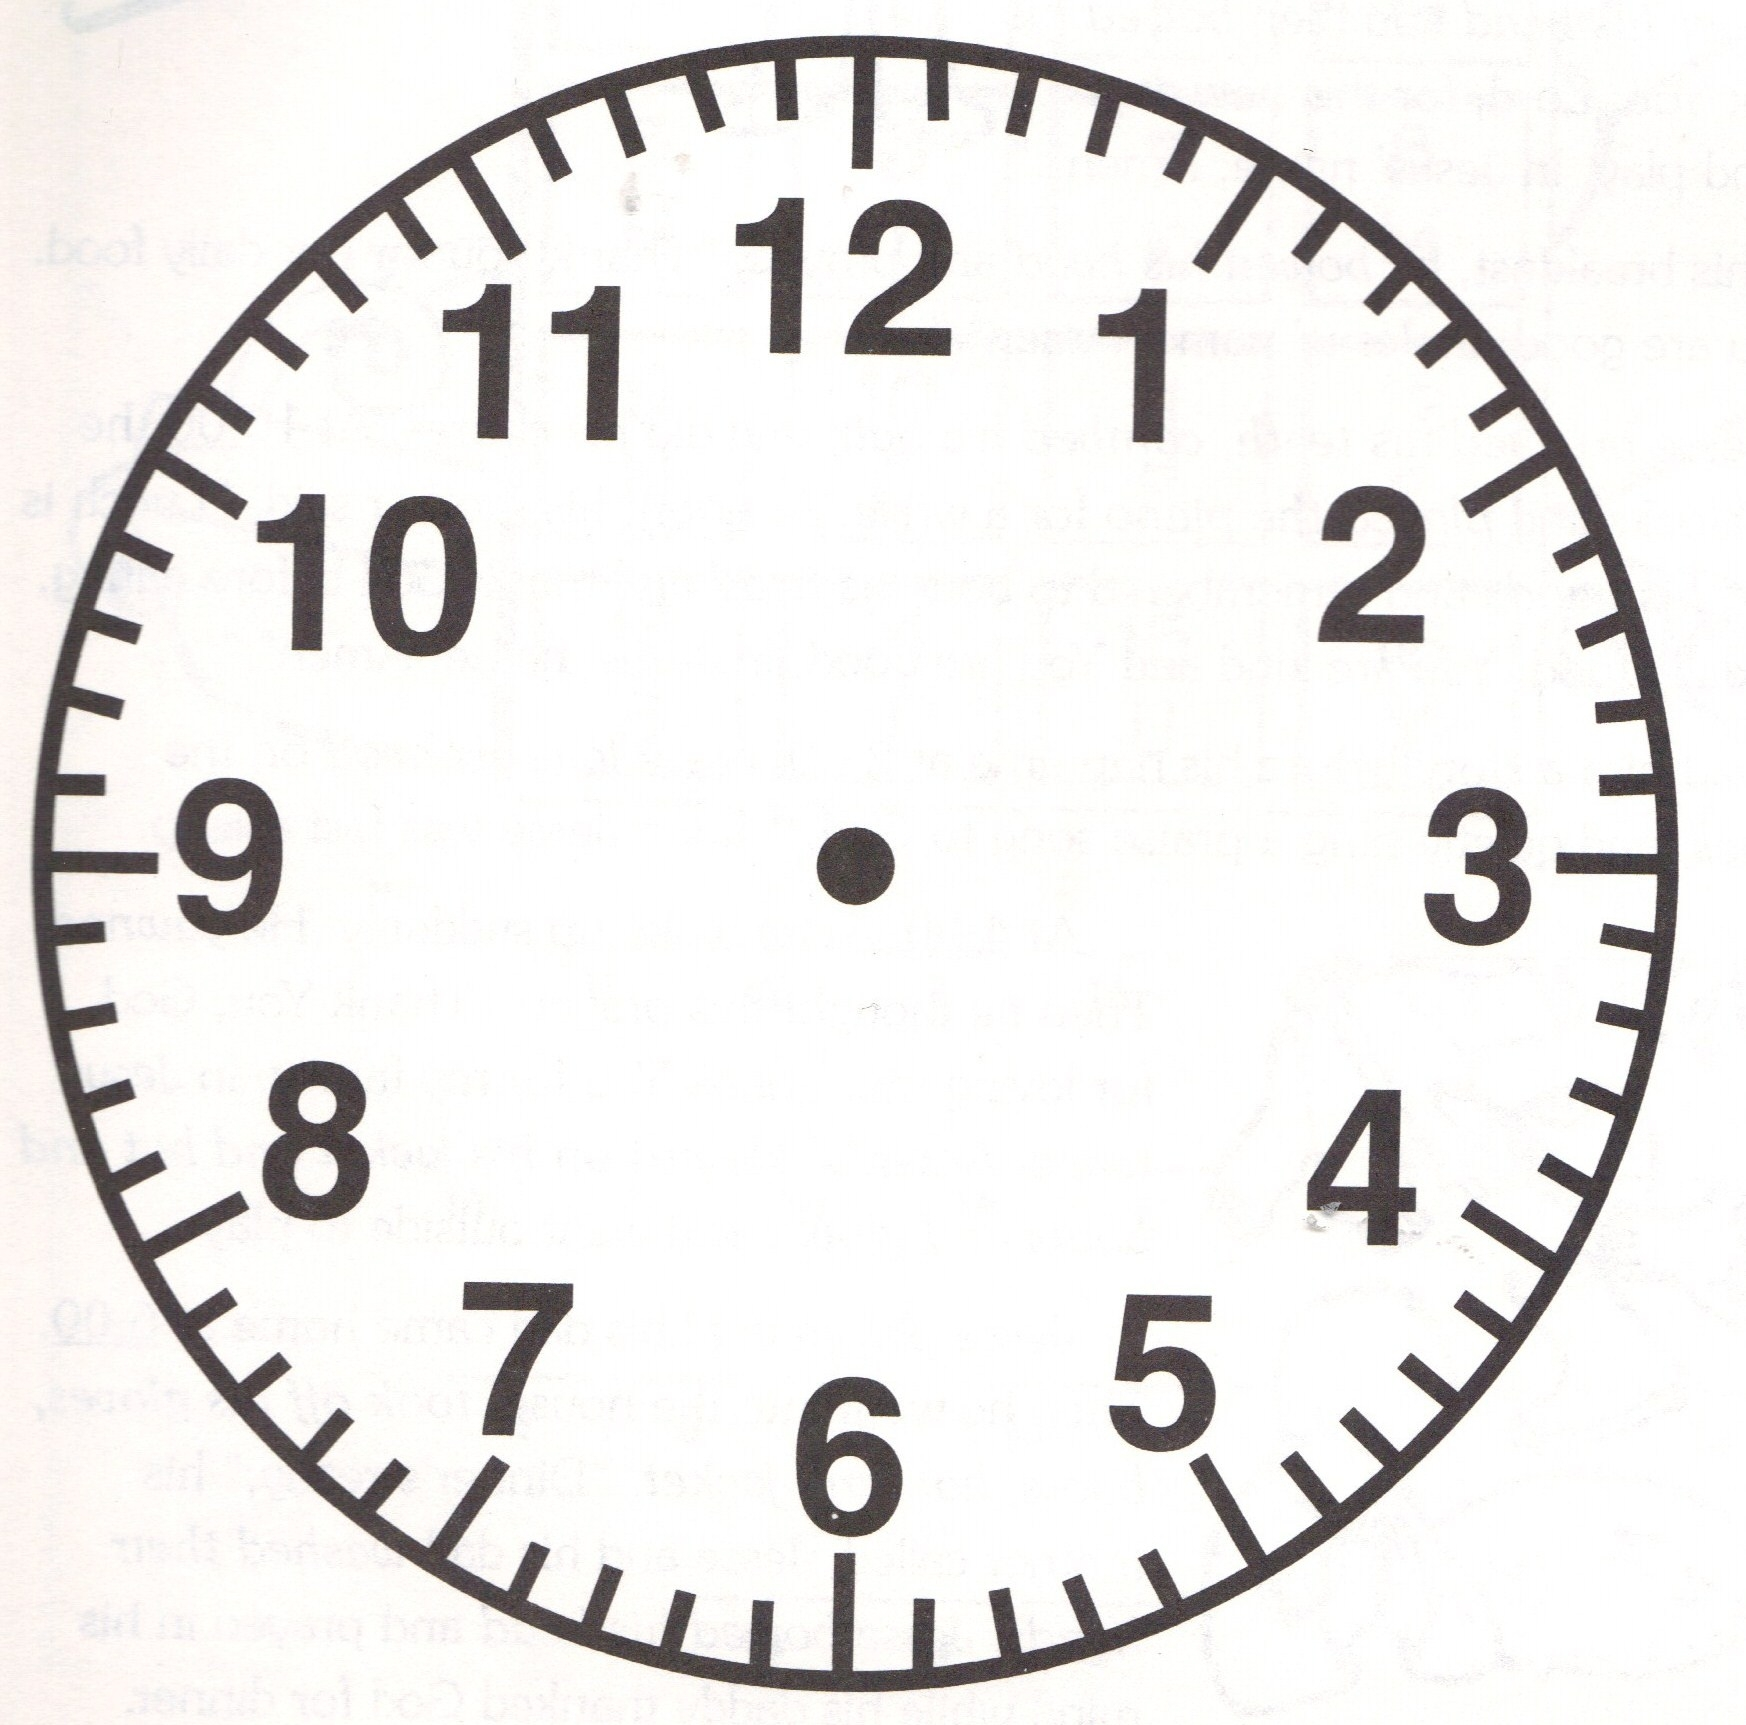 1746x1725 Blank Wall Clock Choice Image